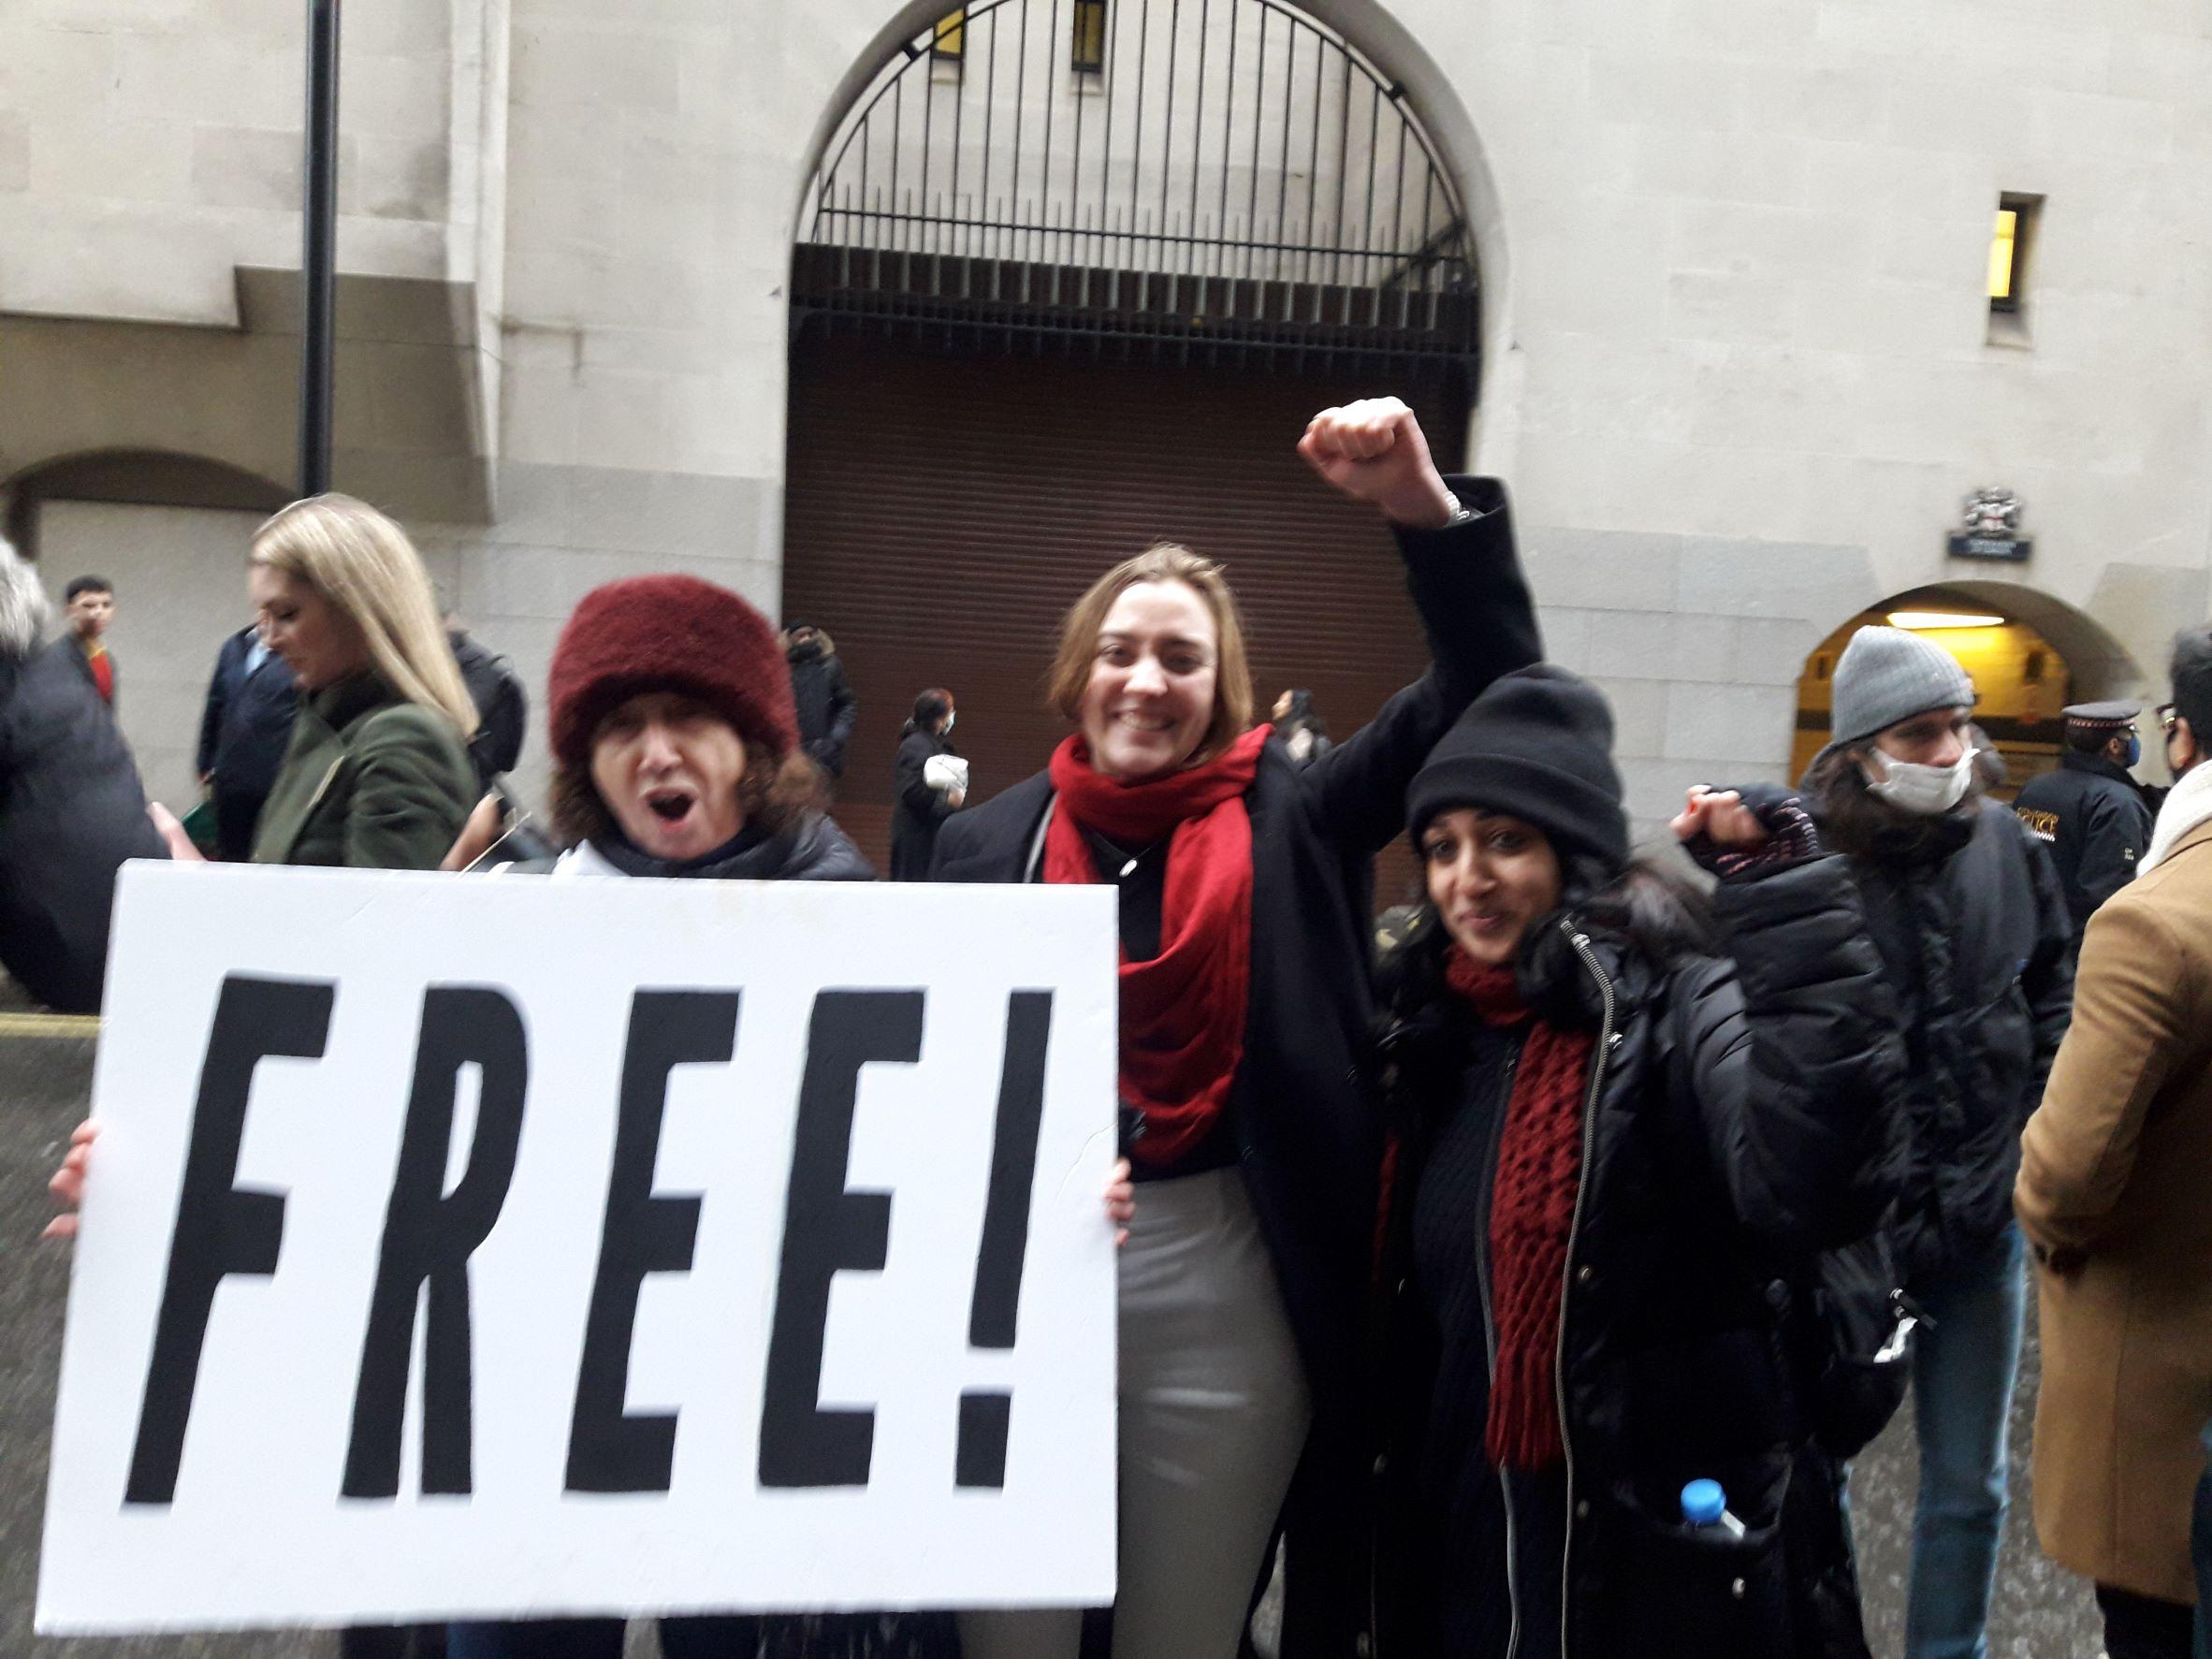 freewomen.jpg